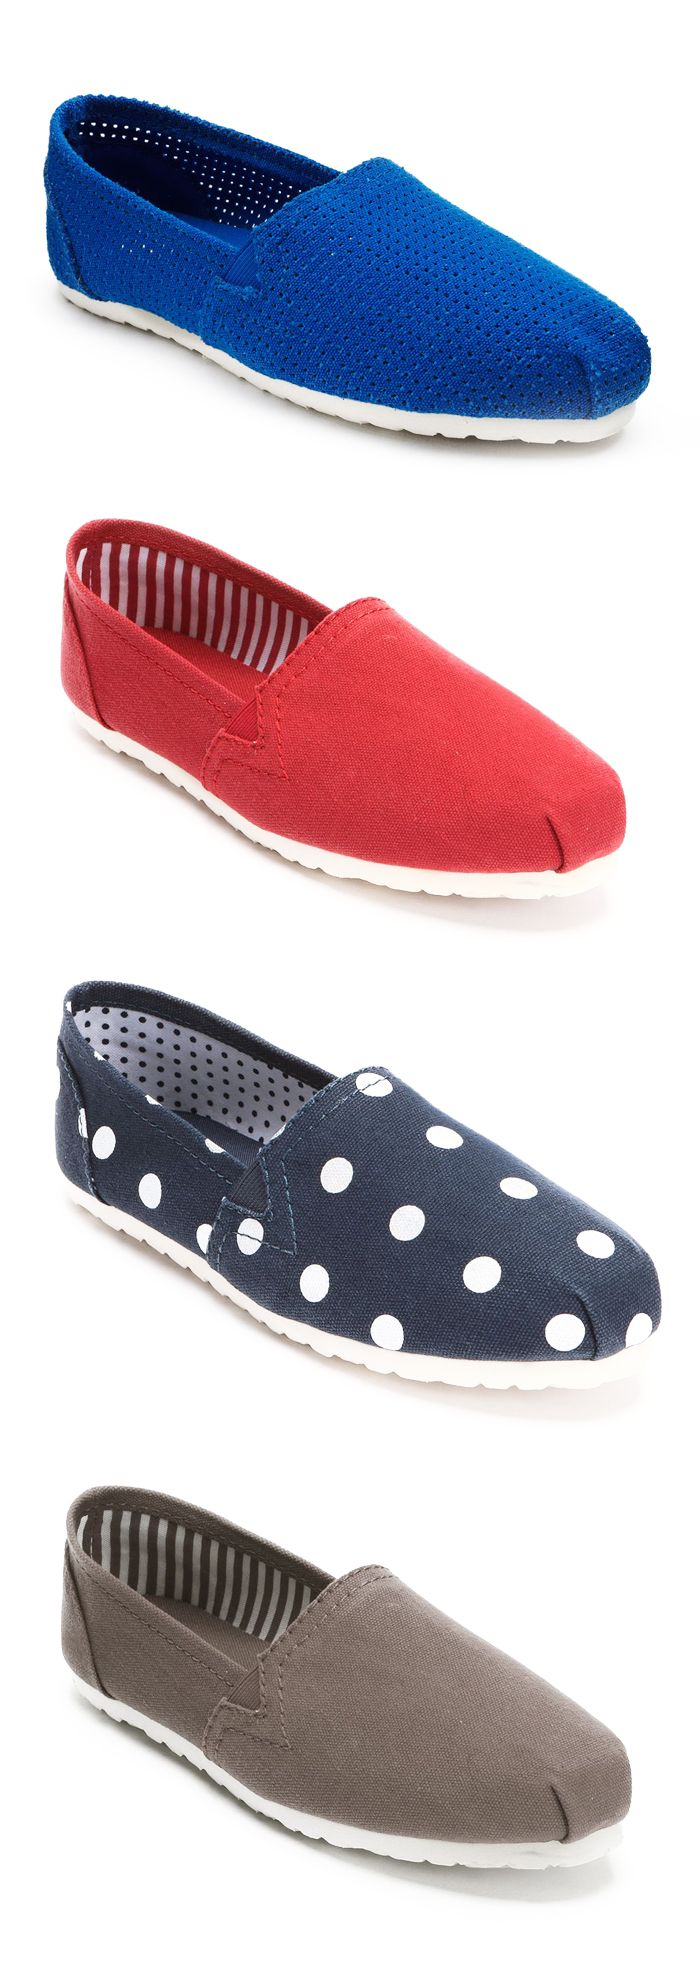 Slip-on comfort without skimping on style. #Kohls